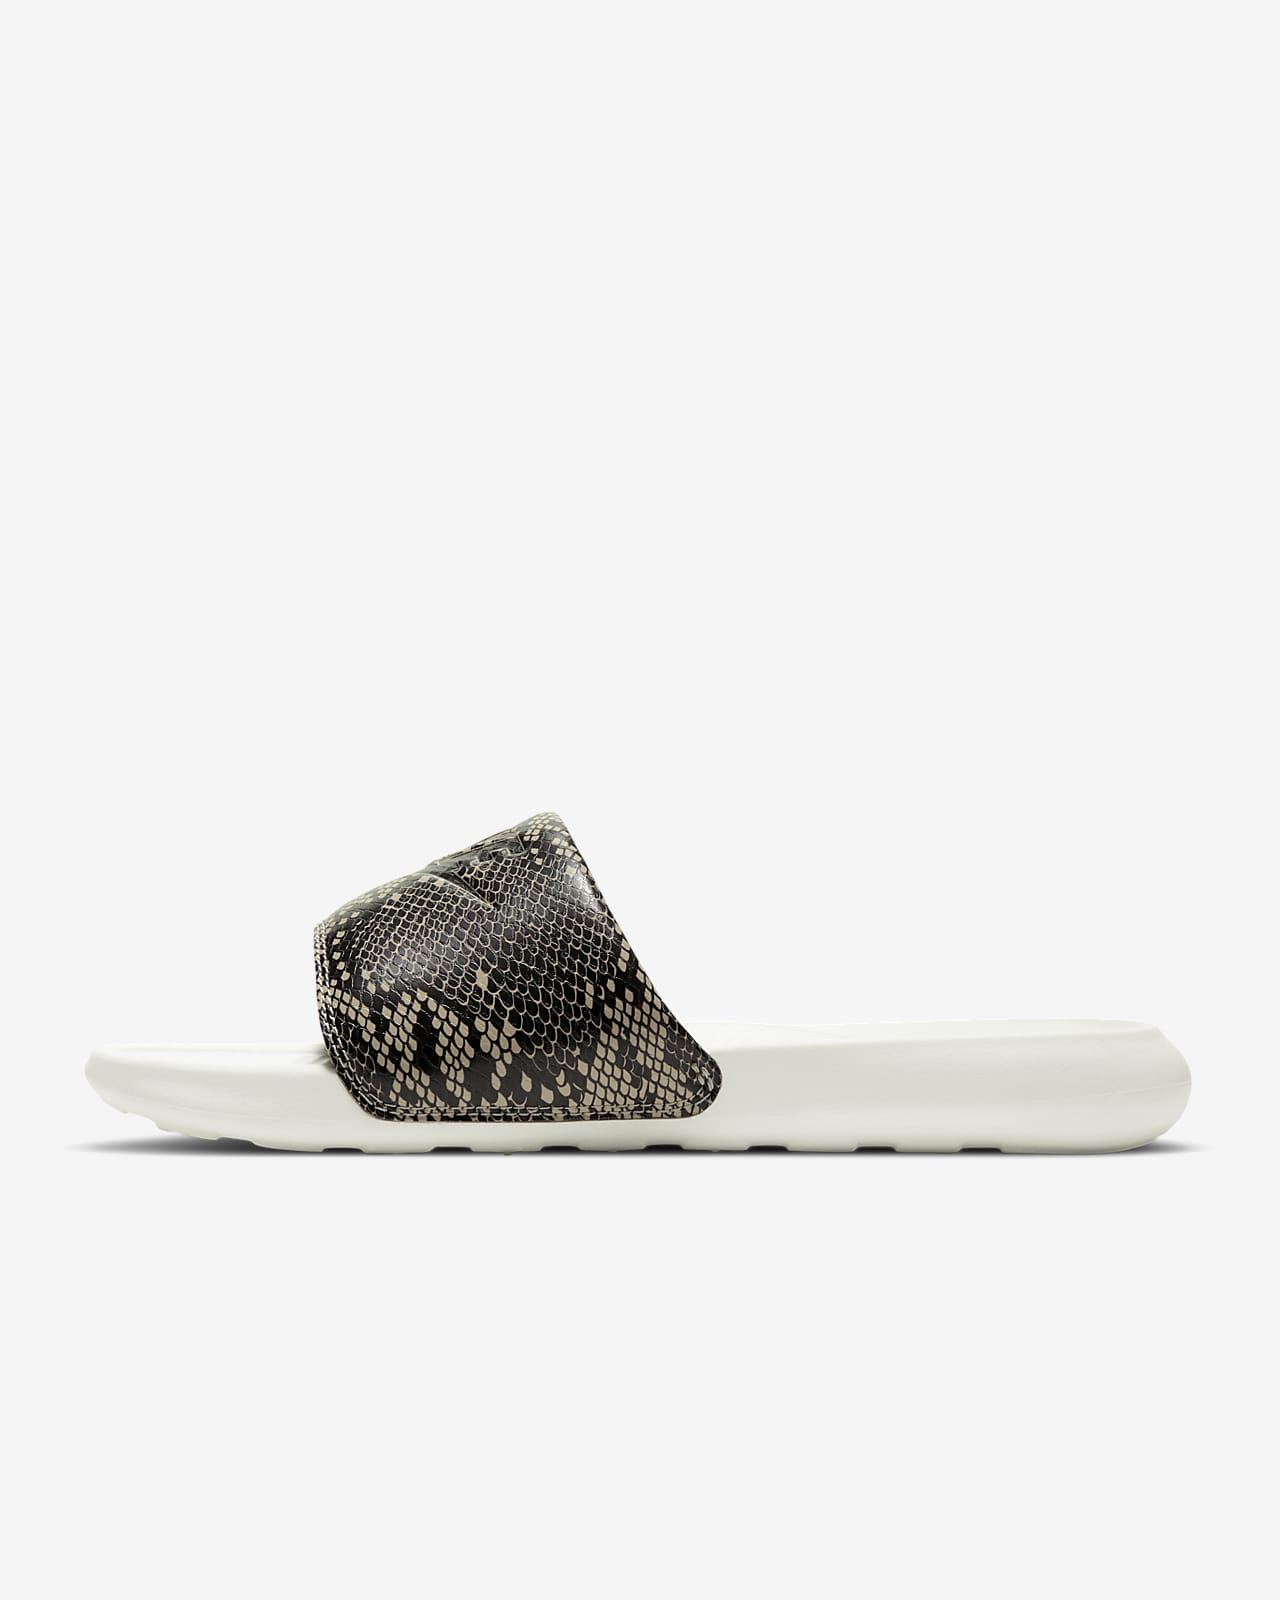 Nike Victori One Damen-Slides mit Print